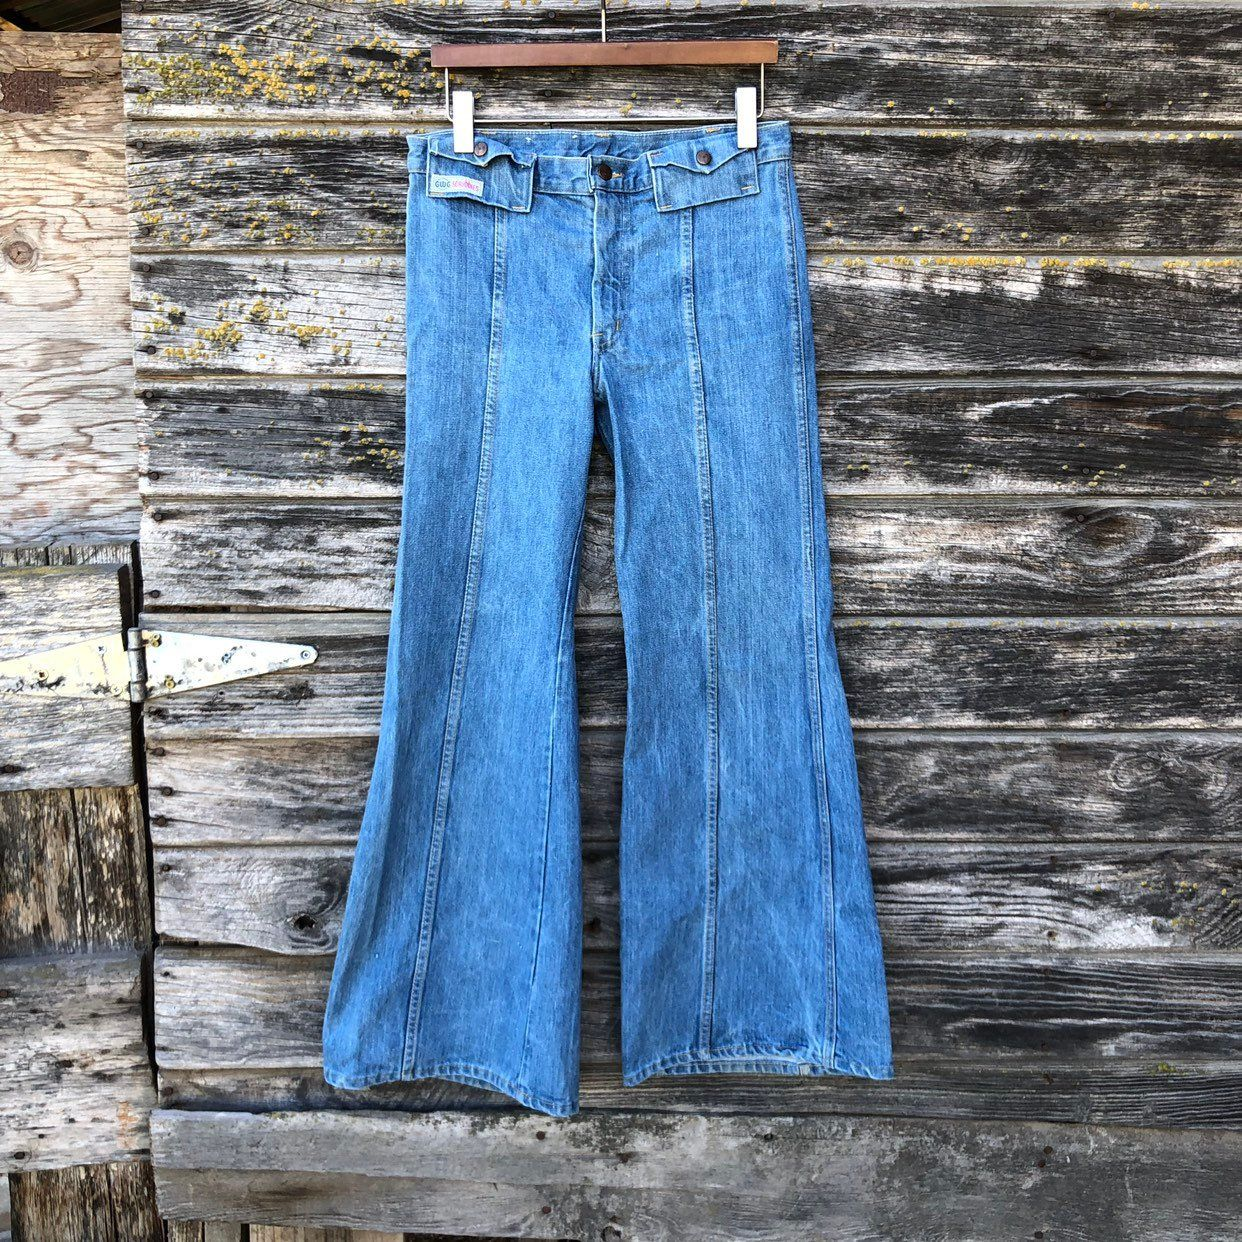 Indigo Dark Wash Boho Flare Jeans Boho Hippie 1970s Flapadoodles Bell Bottom Jeans 70s High Waisted Jeans 24 25 Waist Vintage Jeans